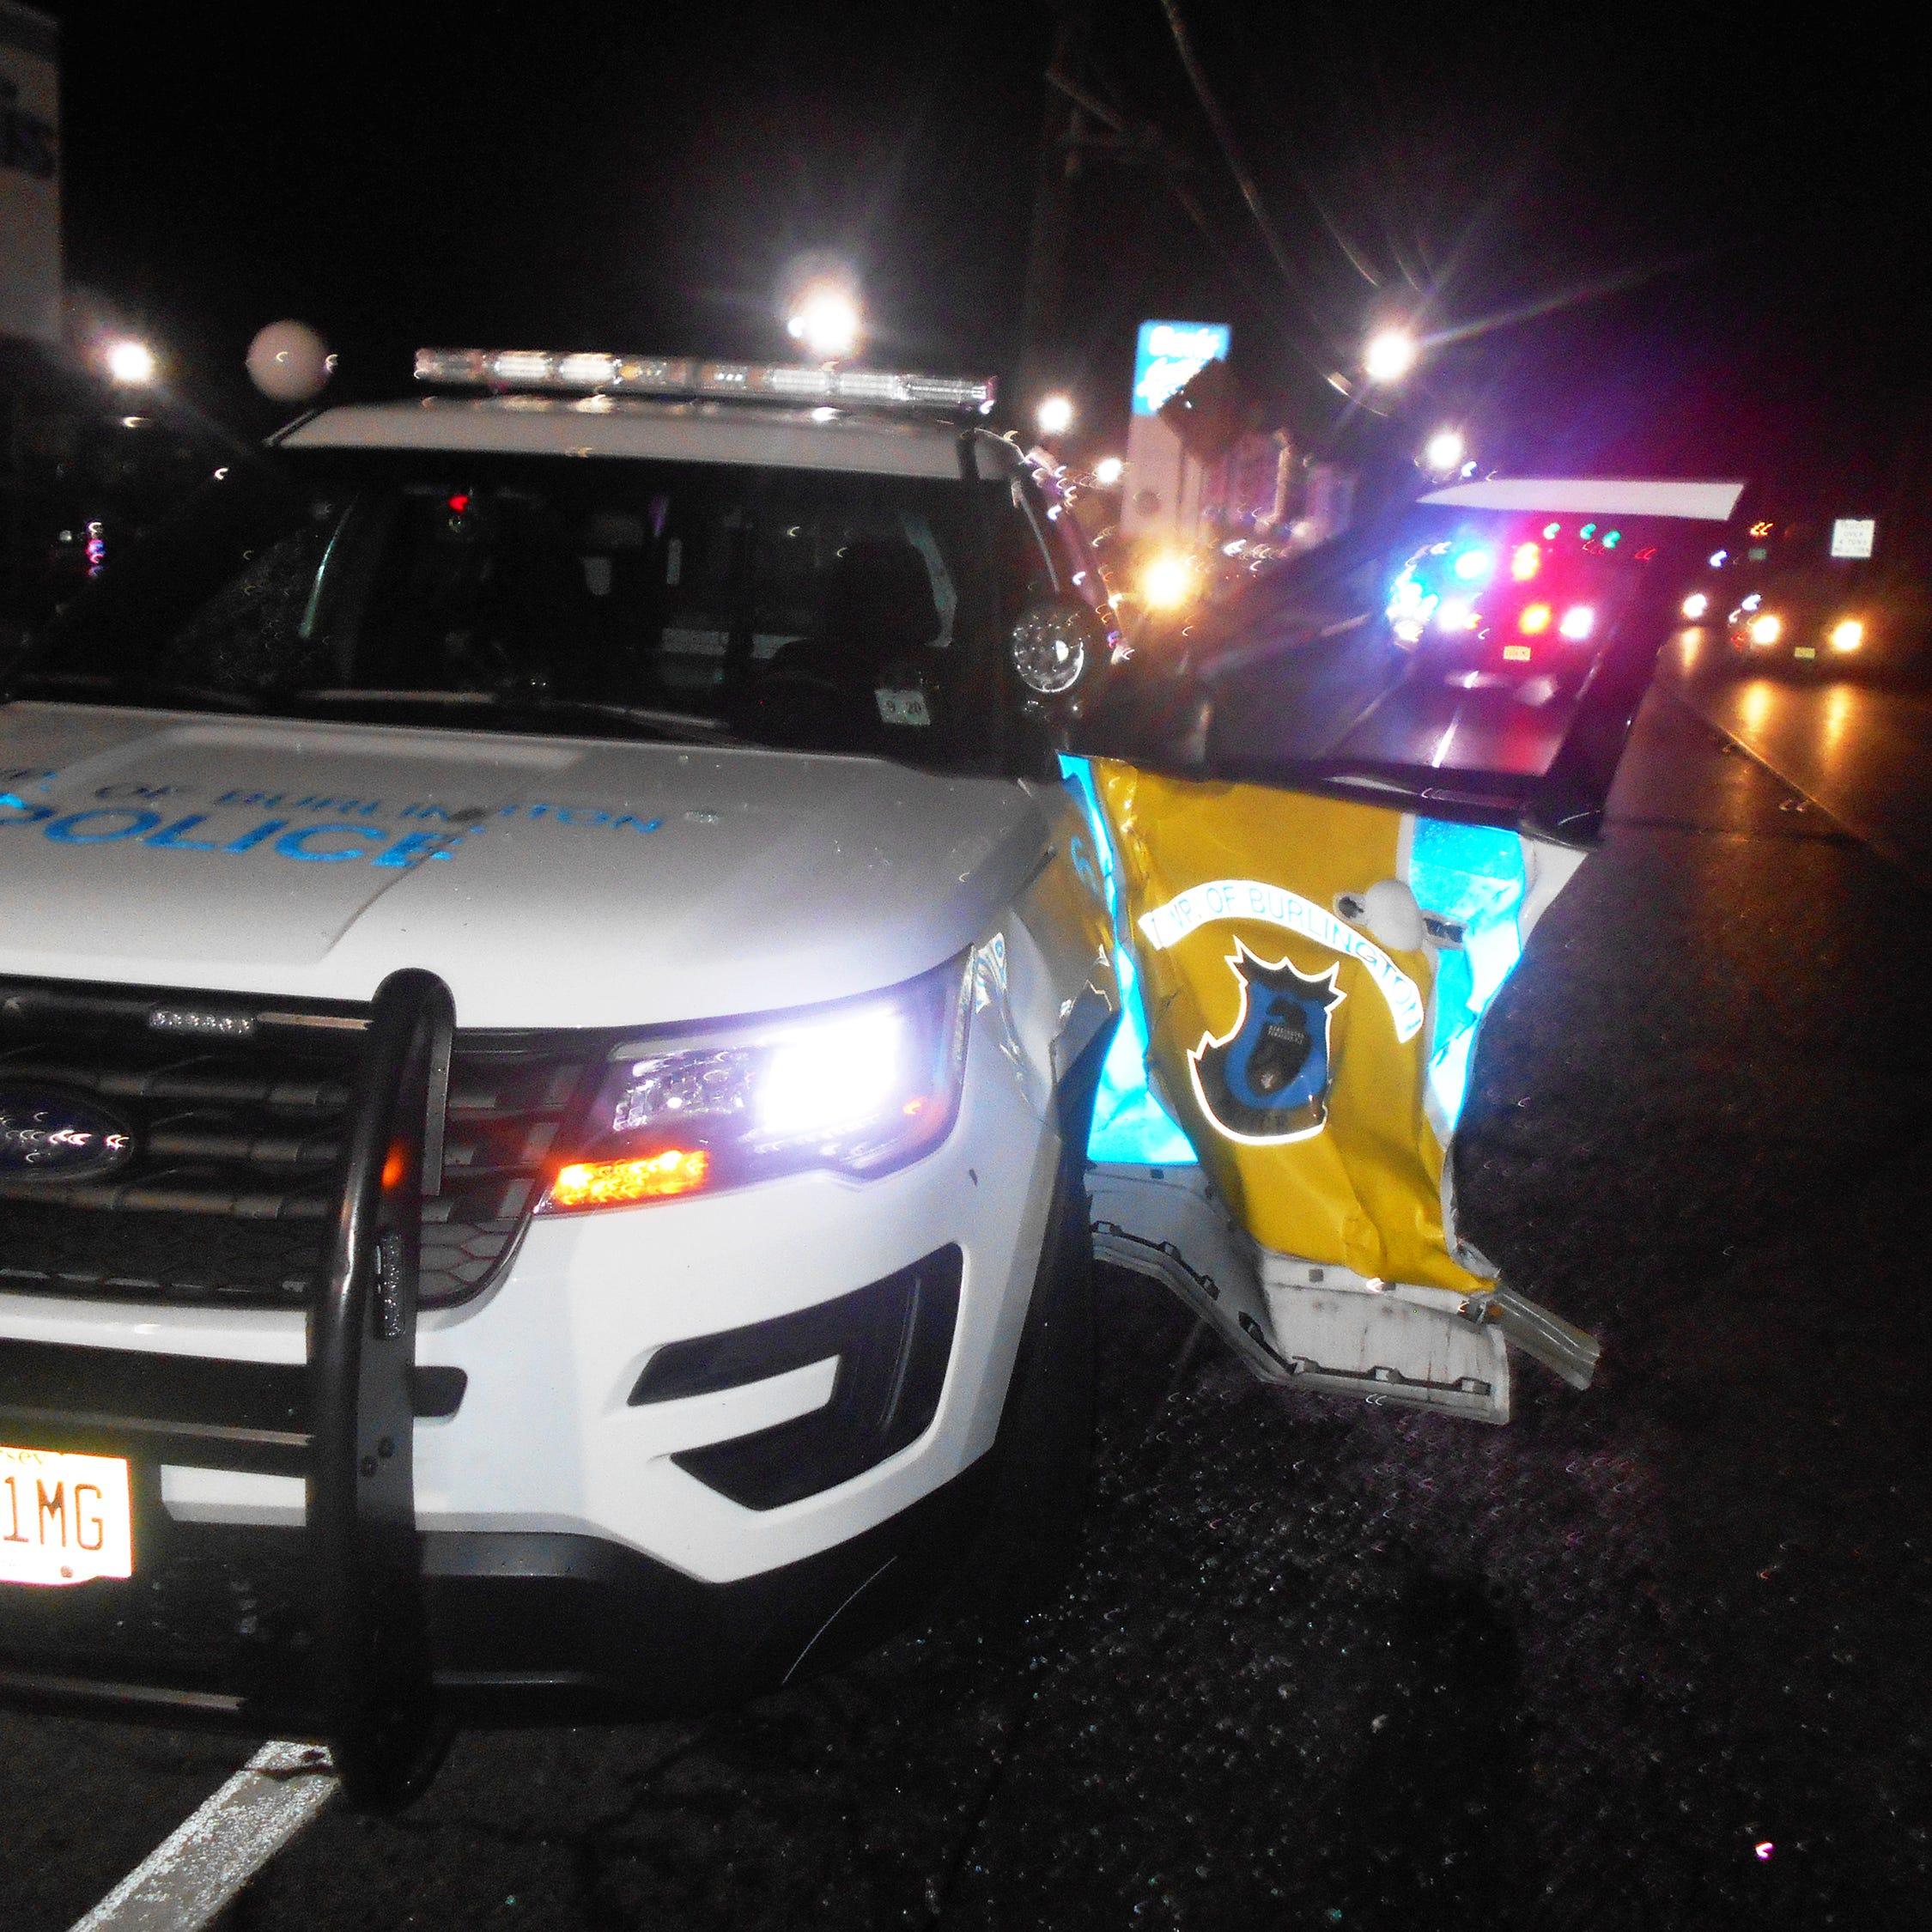 Body cam captures moment passing motorist struck police cruiser